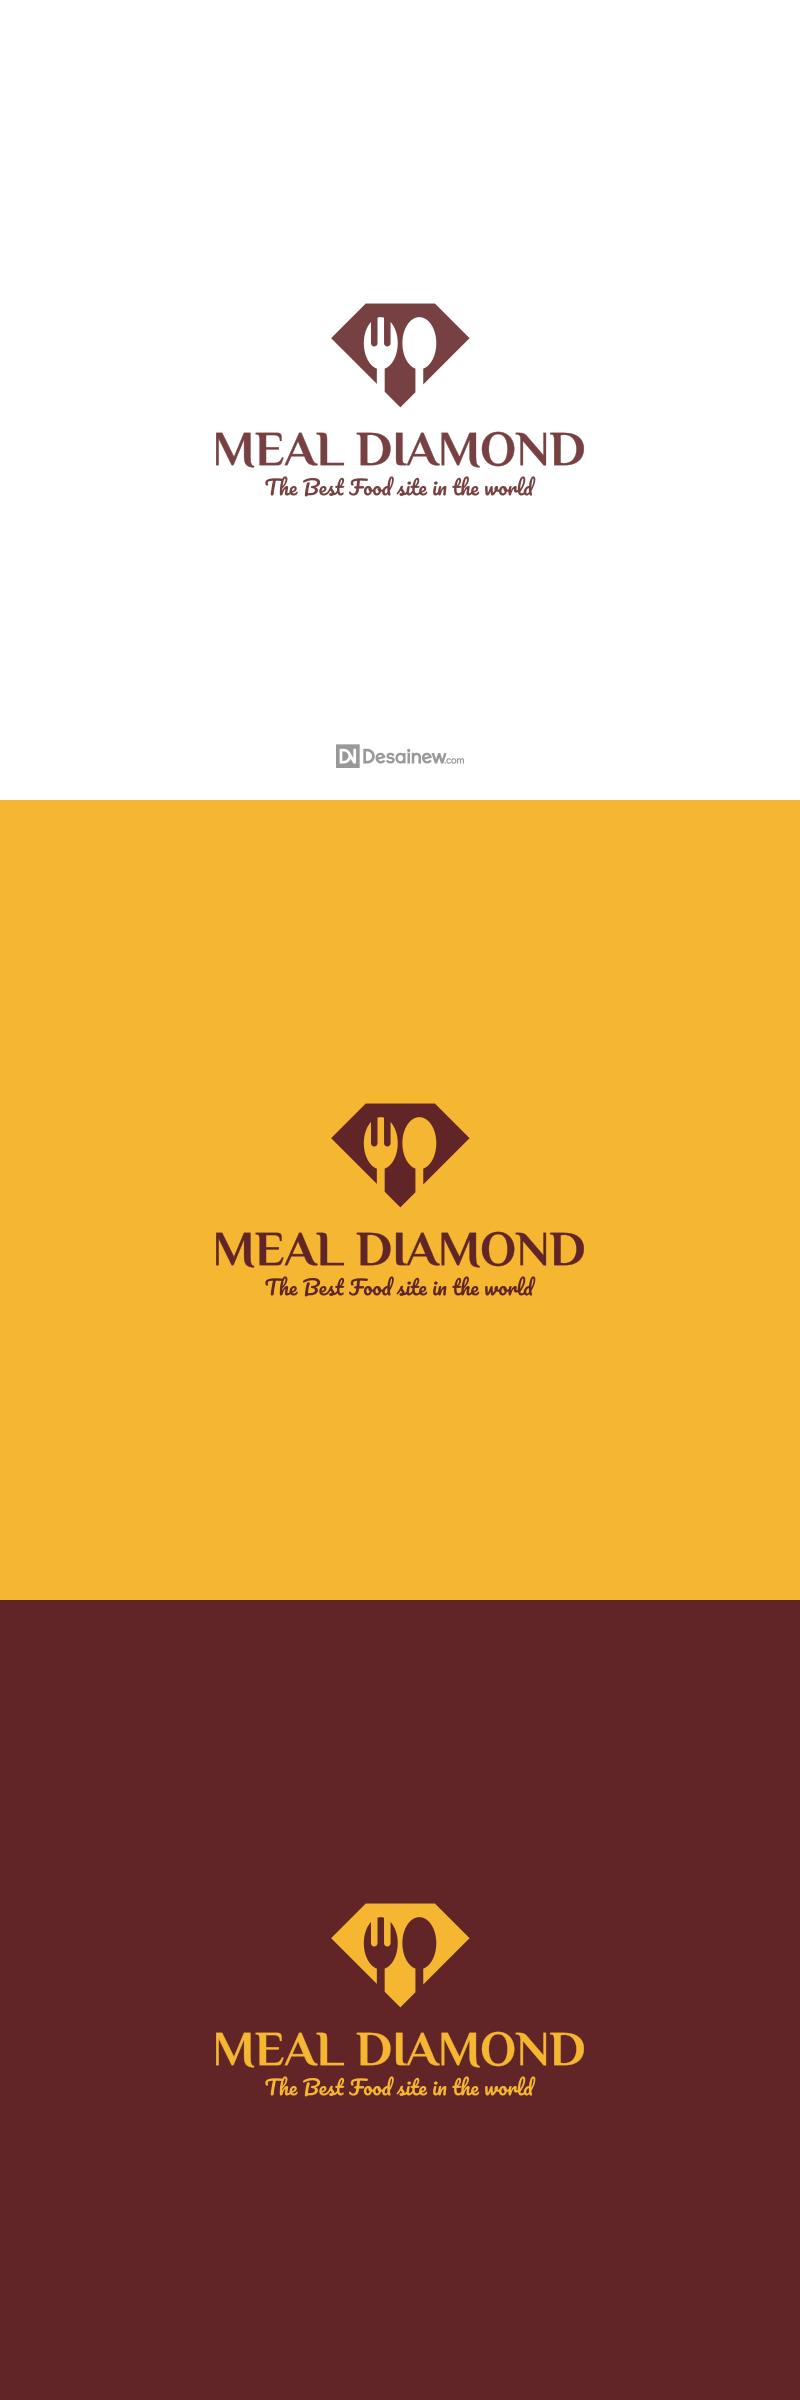 Meal Diamond Logo Design Project Portfolio Desainew Studio